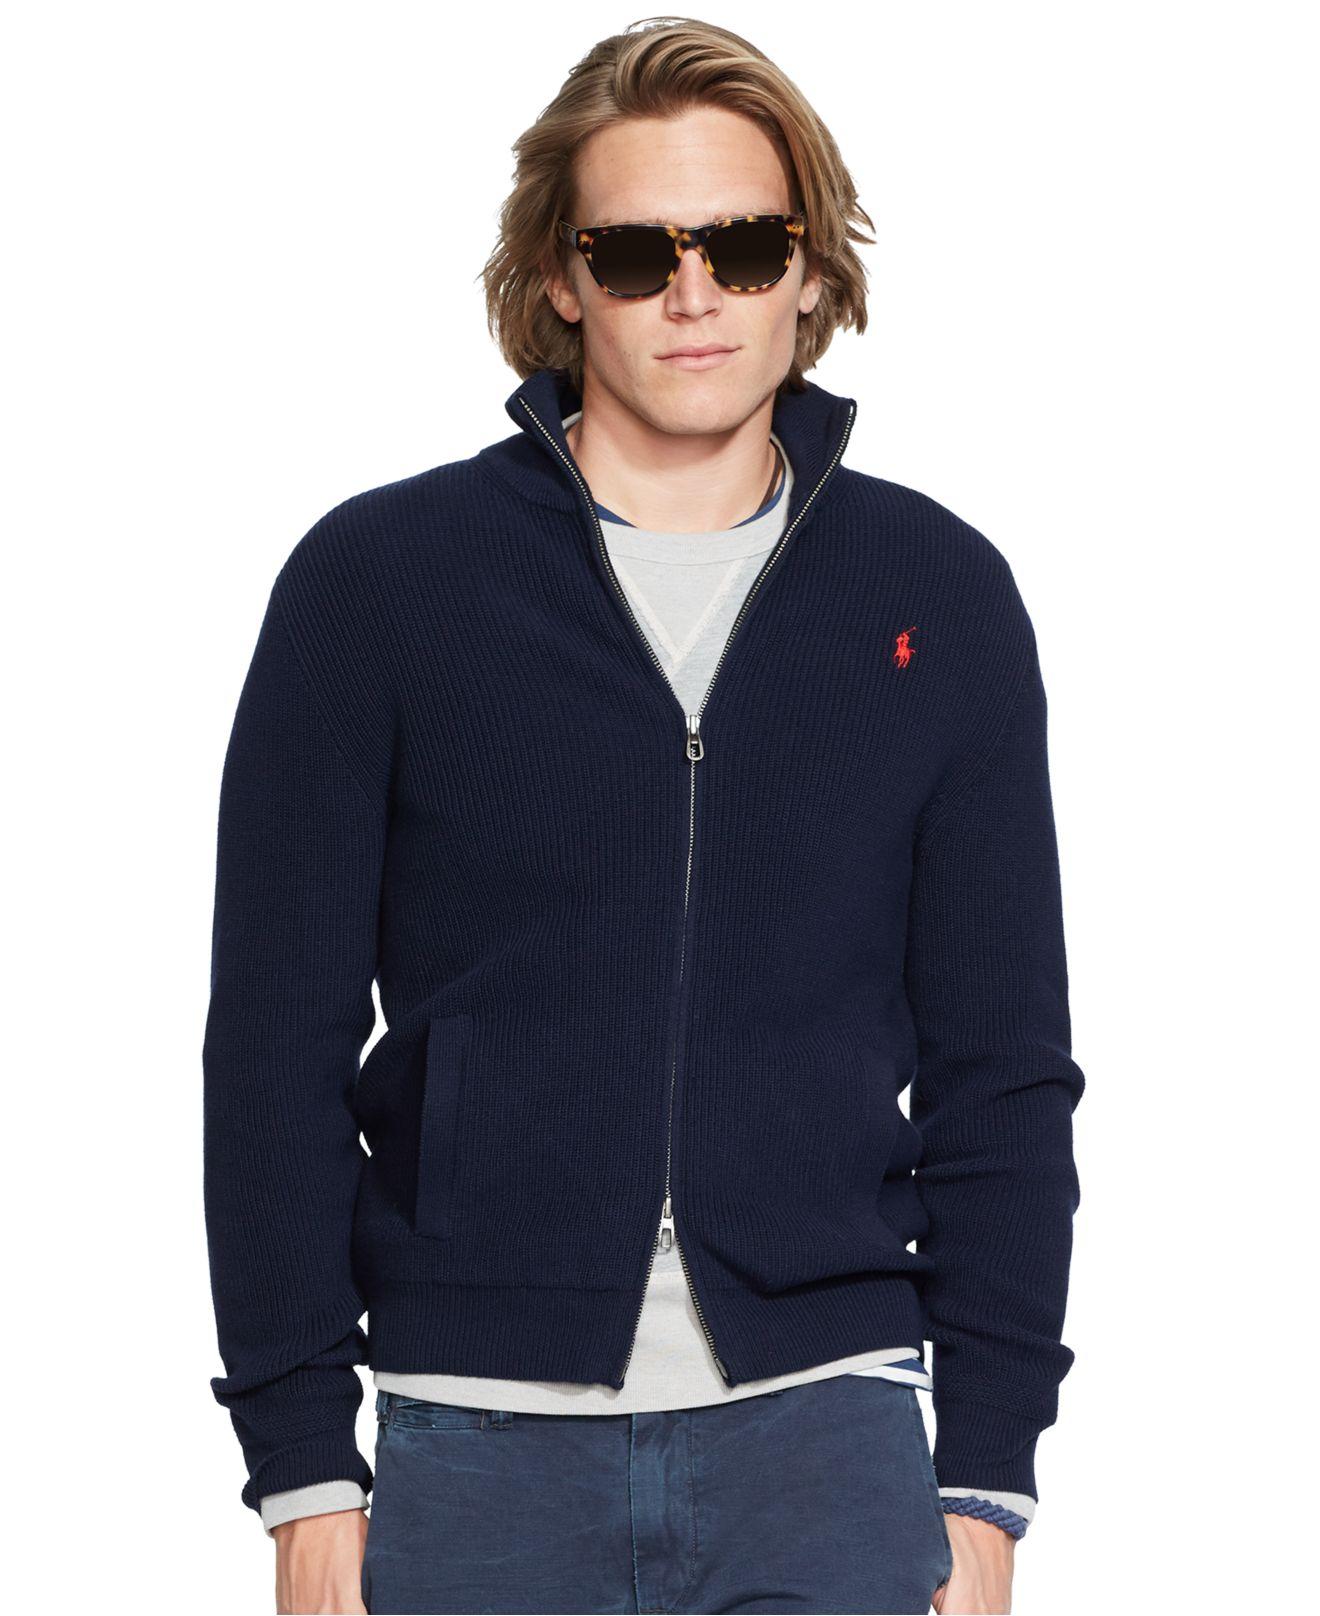 91577f7c175 ... coupon lyst polo ralph lauren lightweight full zip sweater in blue for  men b5ff1 69185